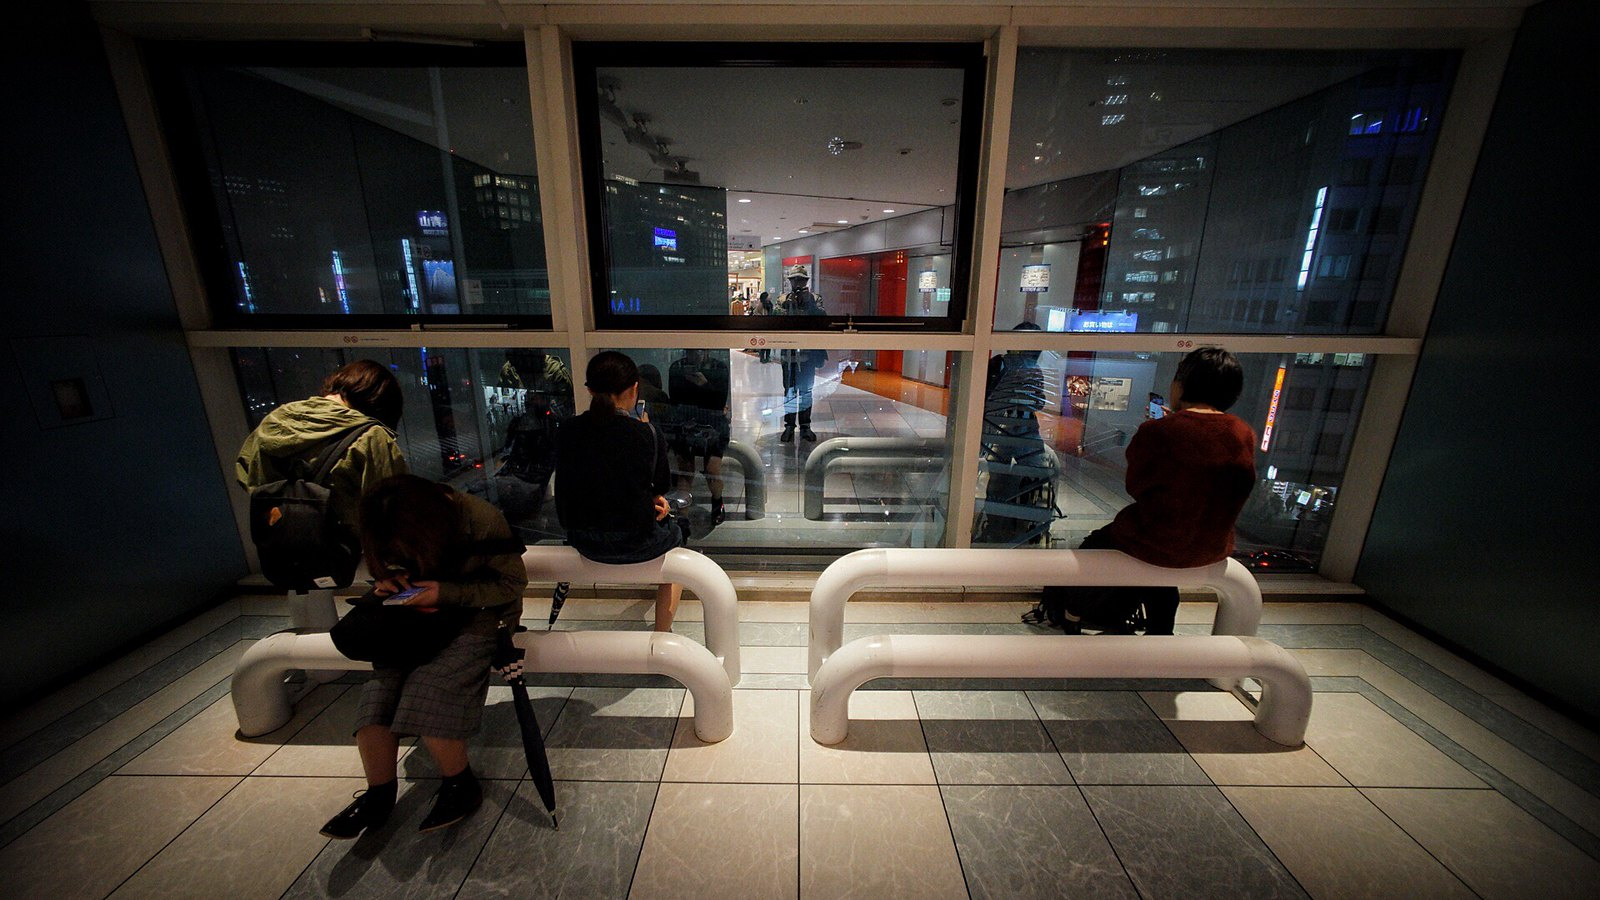 Waiting #Tokyo #Voigtlander12mm #SonyA7 #foto #japan15 #Shinjuku